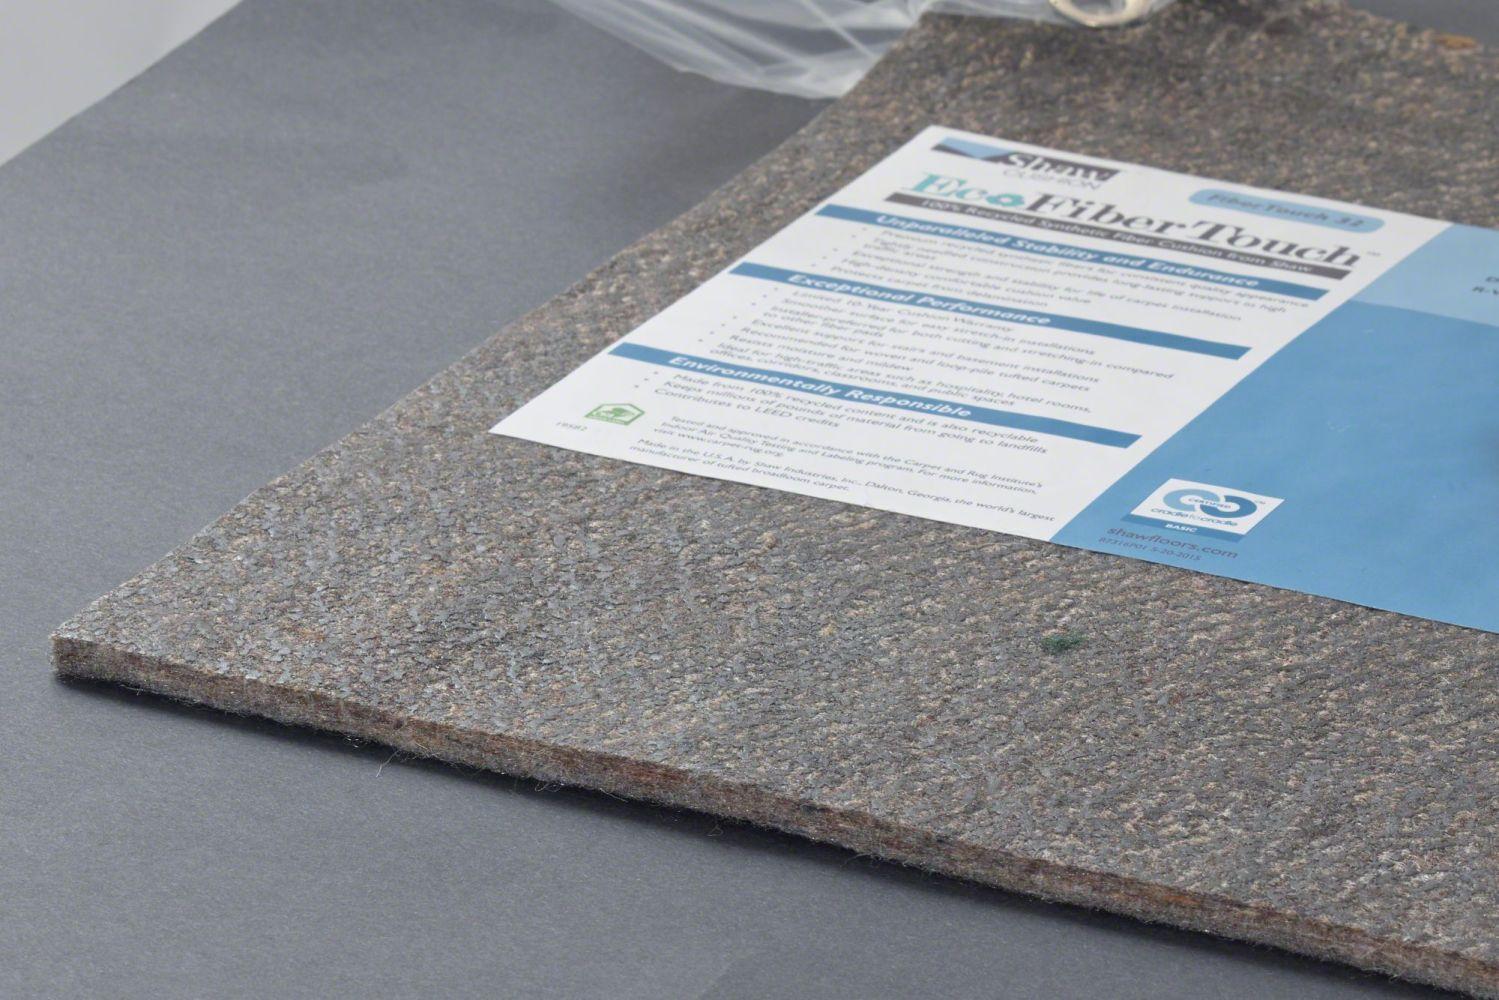 Anderson Tuftex Eco Edge Cushion Div3fibert32-6 Grey 00001_513PD